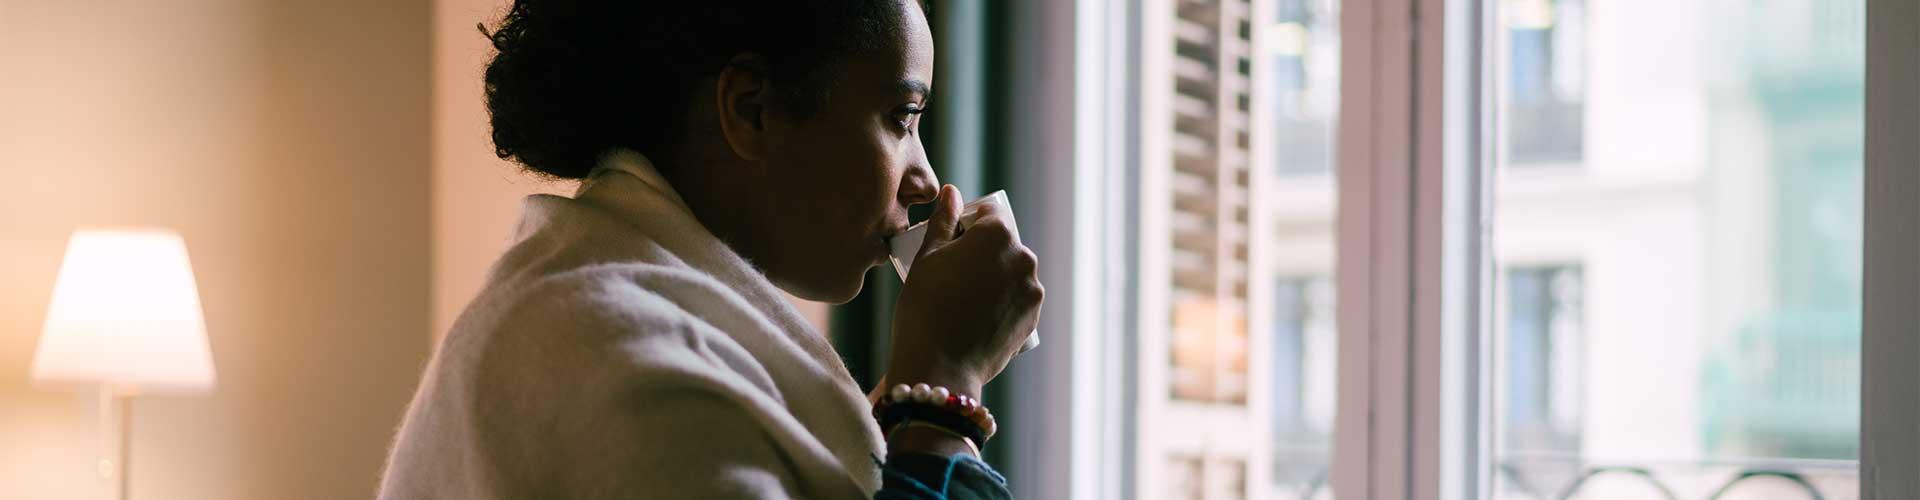 Woman sips coffee looking out window